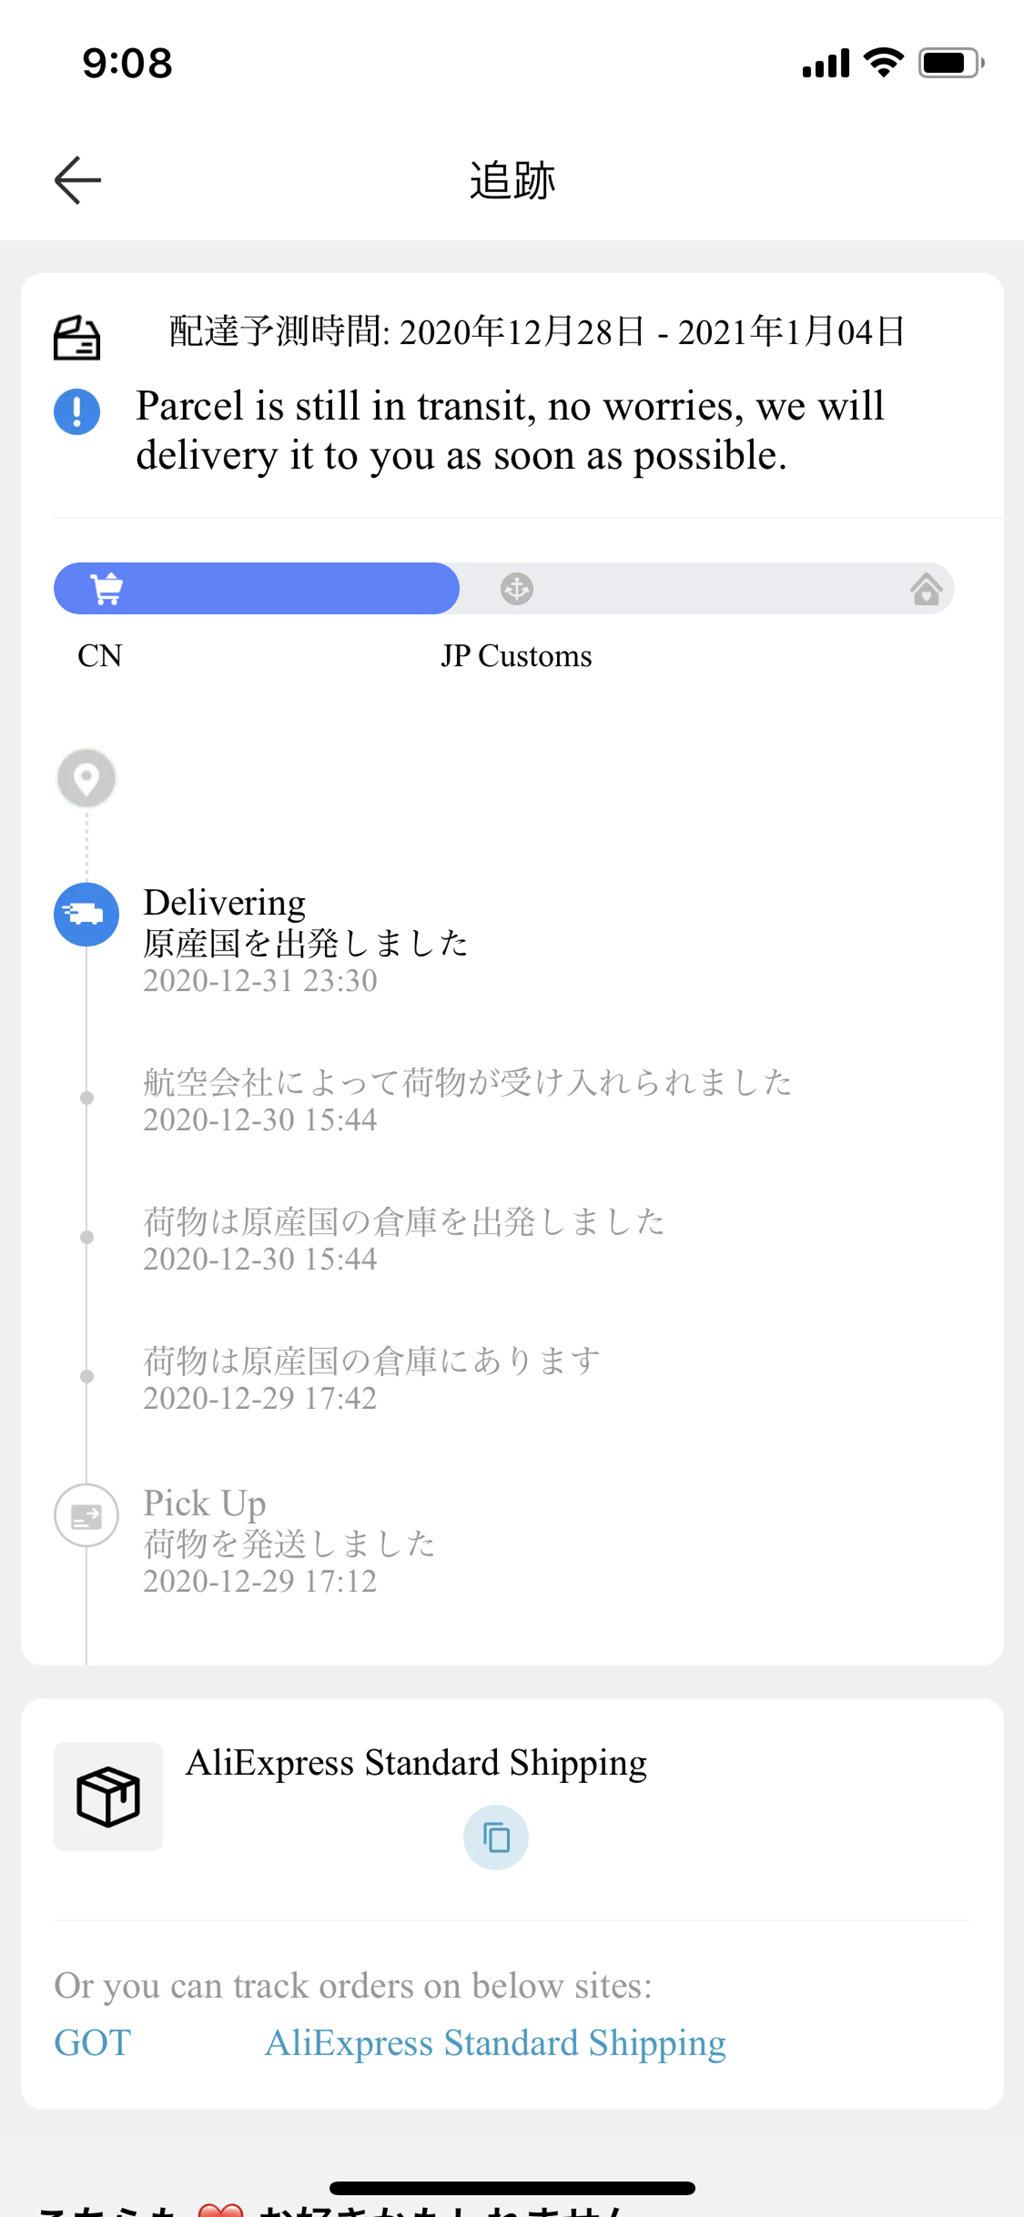 AliExpress:アプリの追跡画面。荷物の移動は、マメに表示されているのですが・・・。